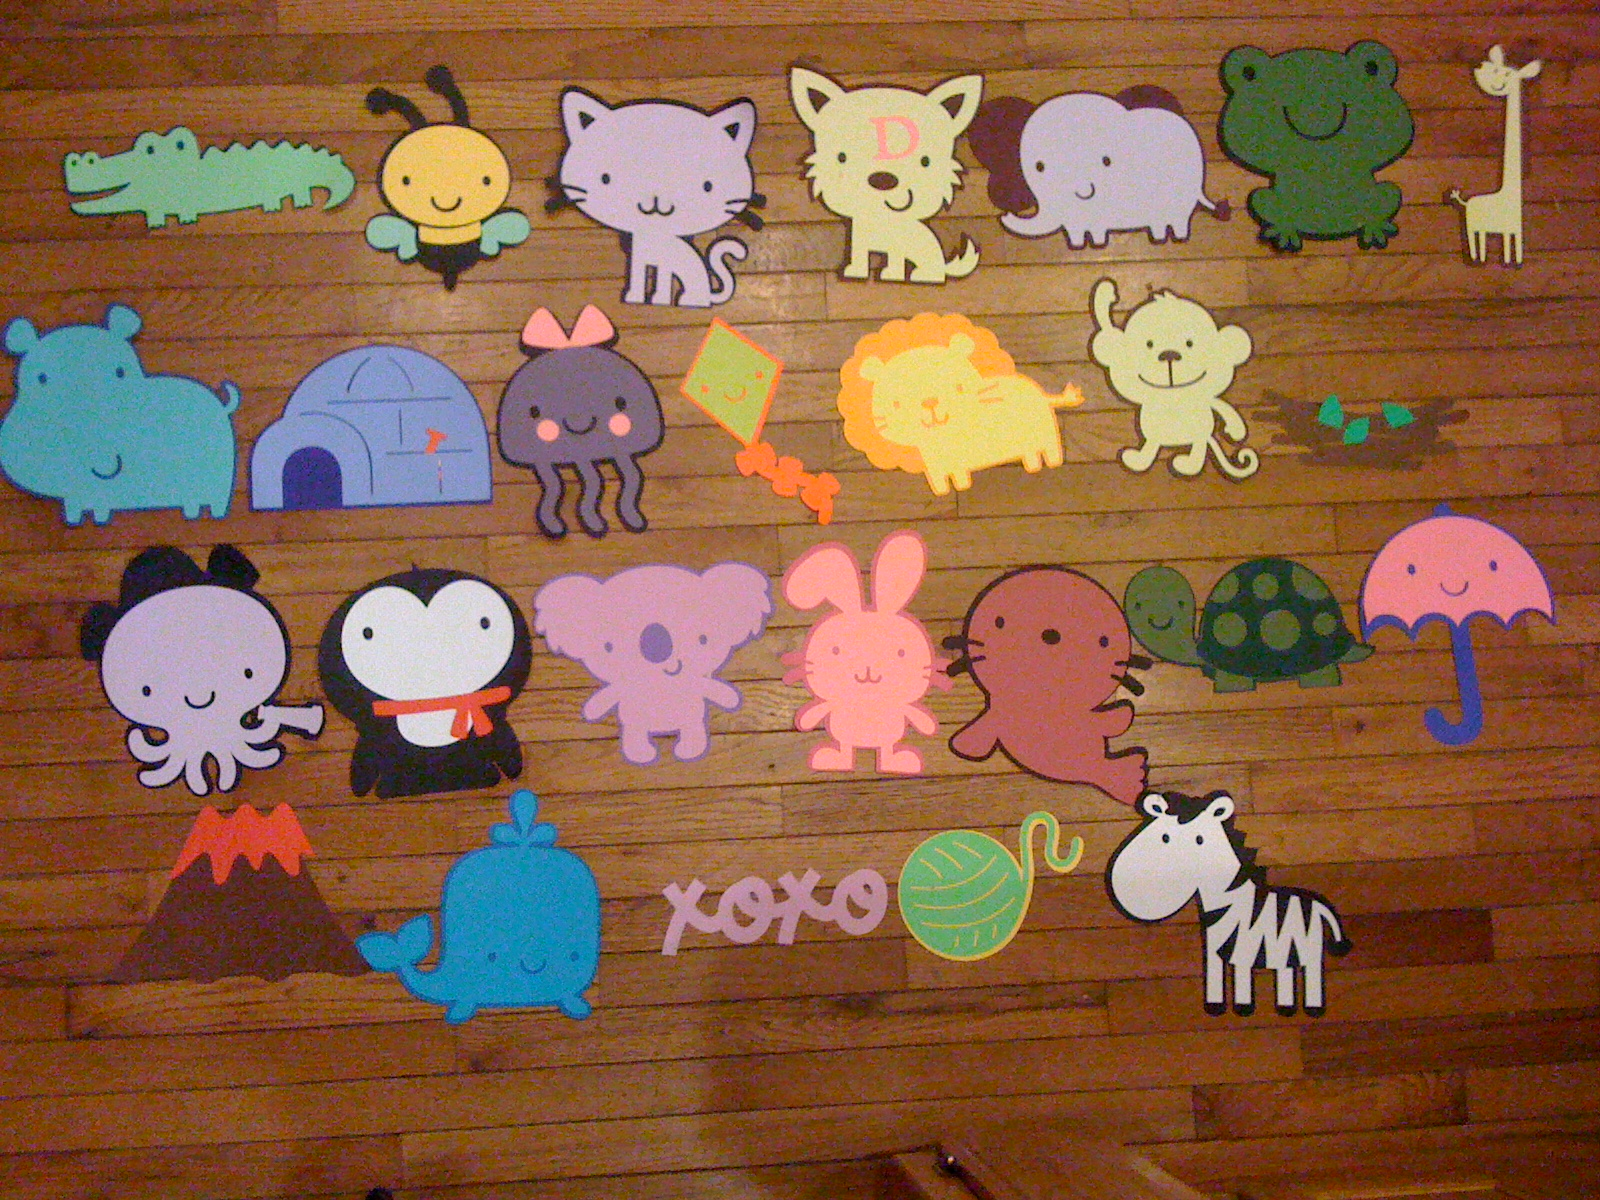 Scrap A Moment Create A Critter Cartridge Classroom Activity : IMG0594 from scrap-a-moment.blogspot.com size 1600 x 1200 jpeg 1008kB